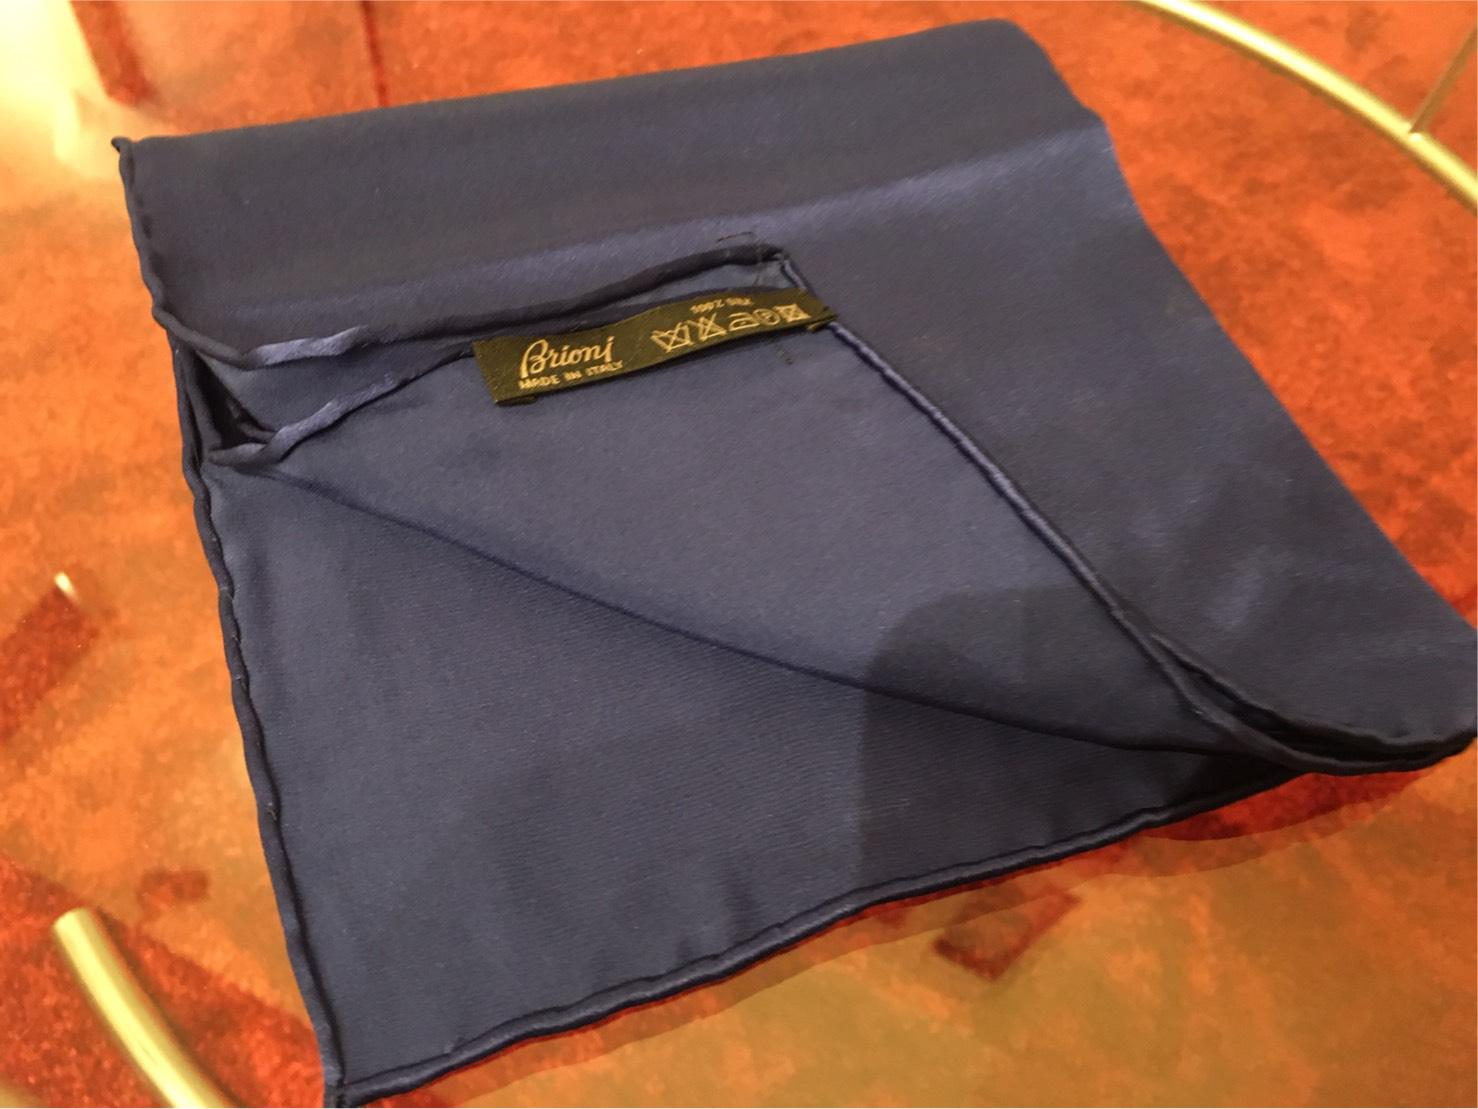 Brioni Bespoke Shirt fabric